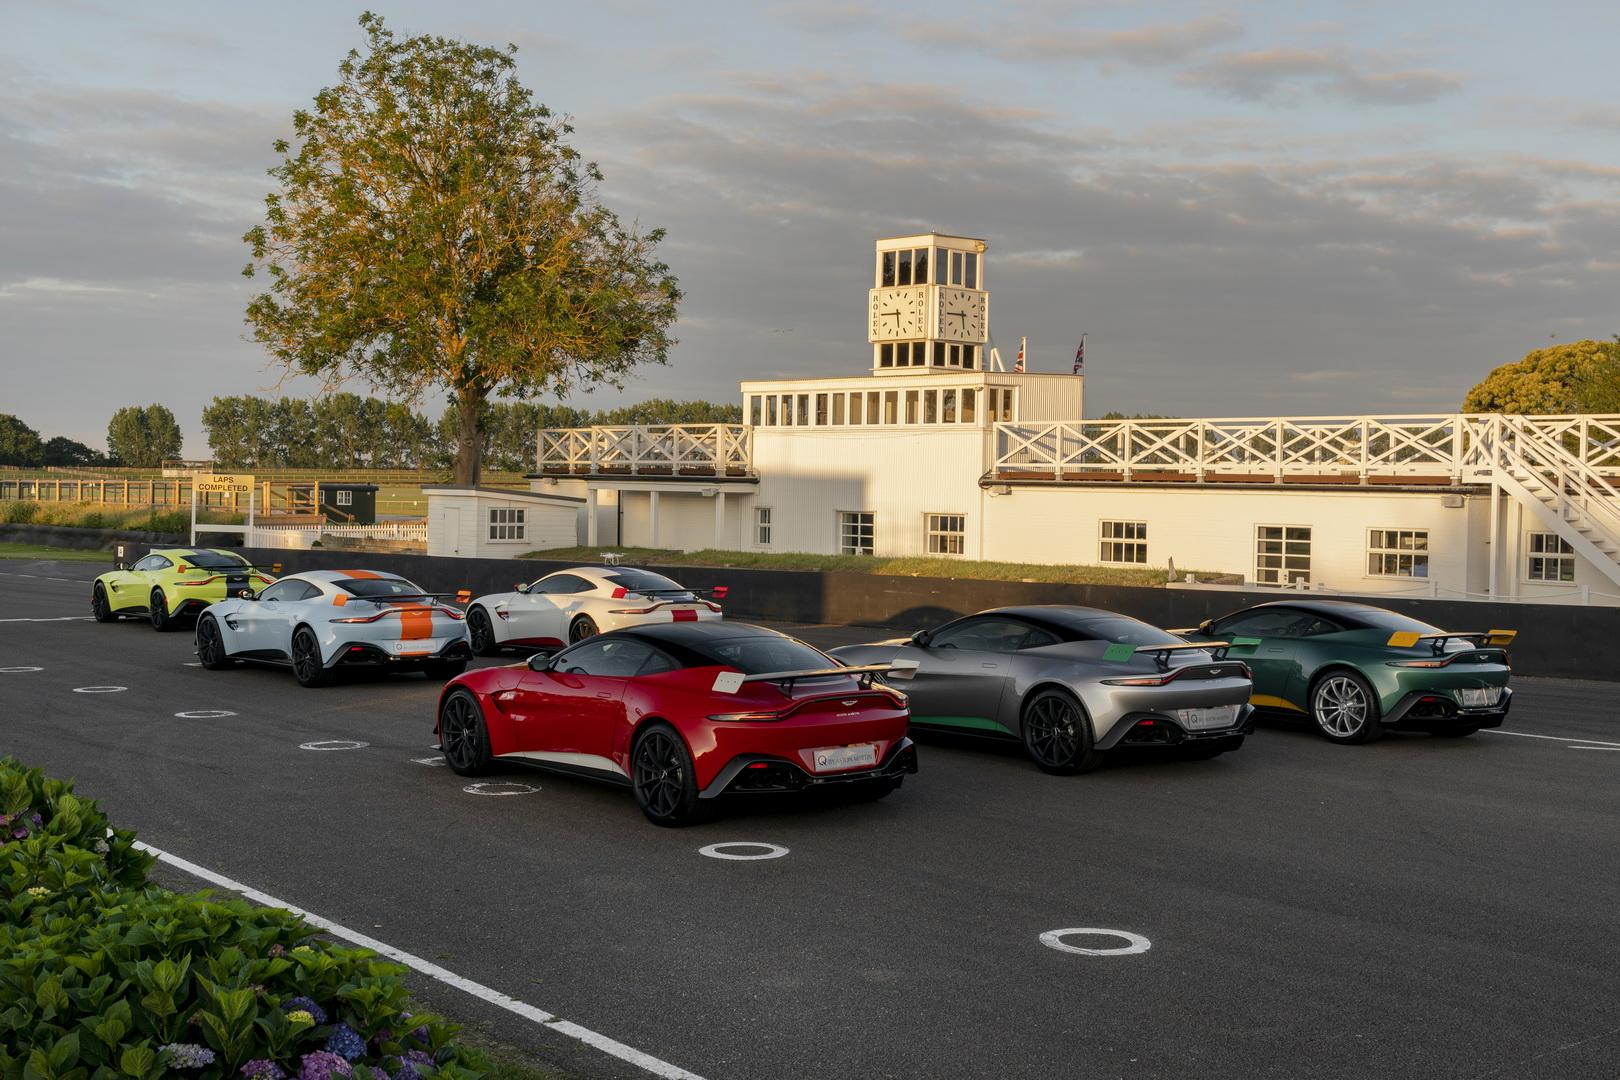 13074d81-2019-aston-martin-vantage-heritage-racing-editions-10.jpg